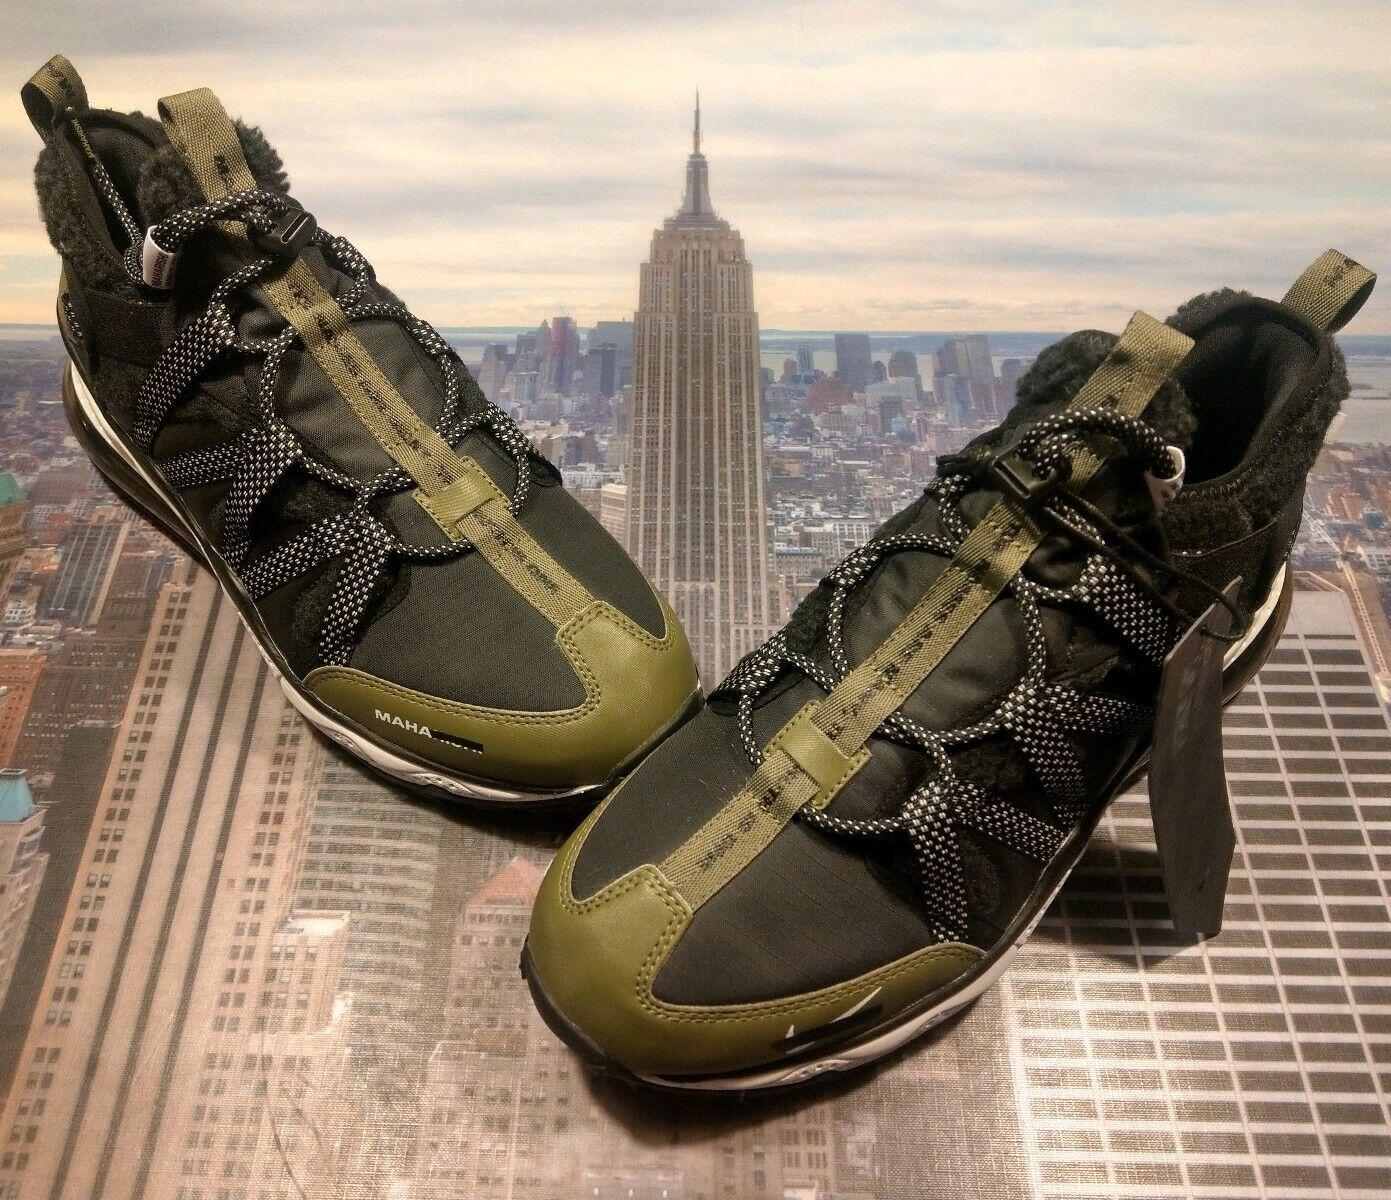 Nike iD Air Max 270 Bowfin By Maharishi Black Green Size 10 CJ4385 991 New Rare